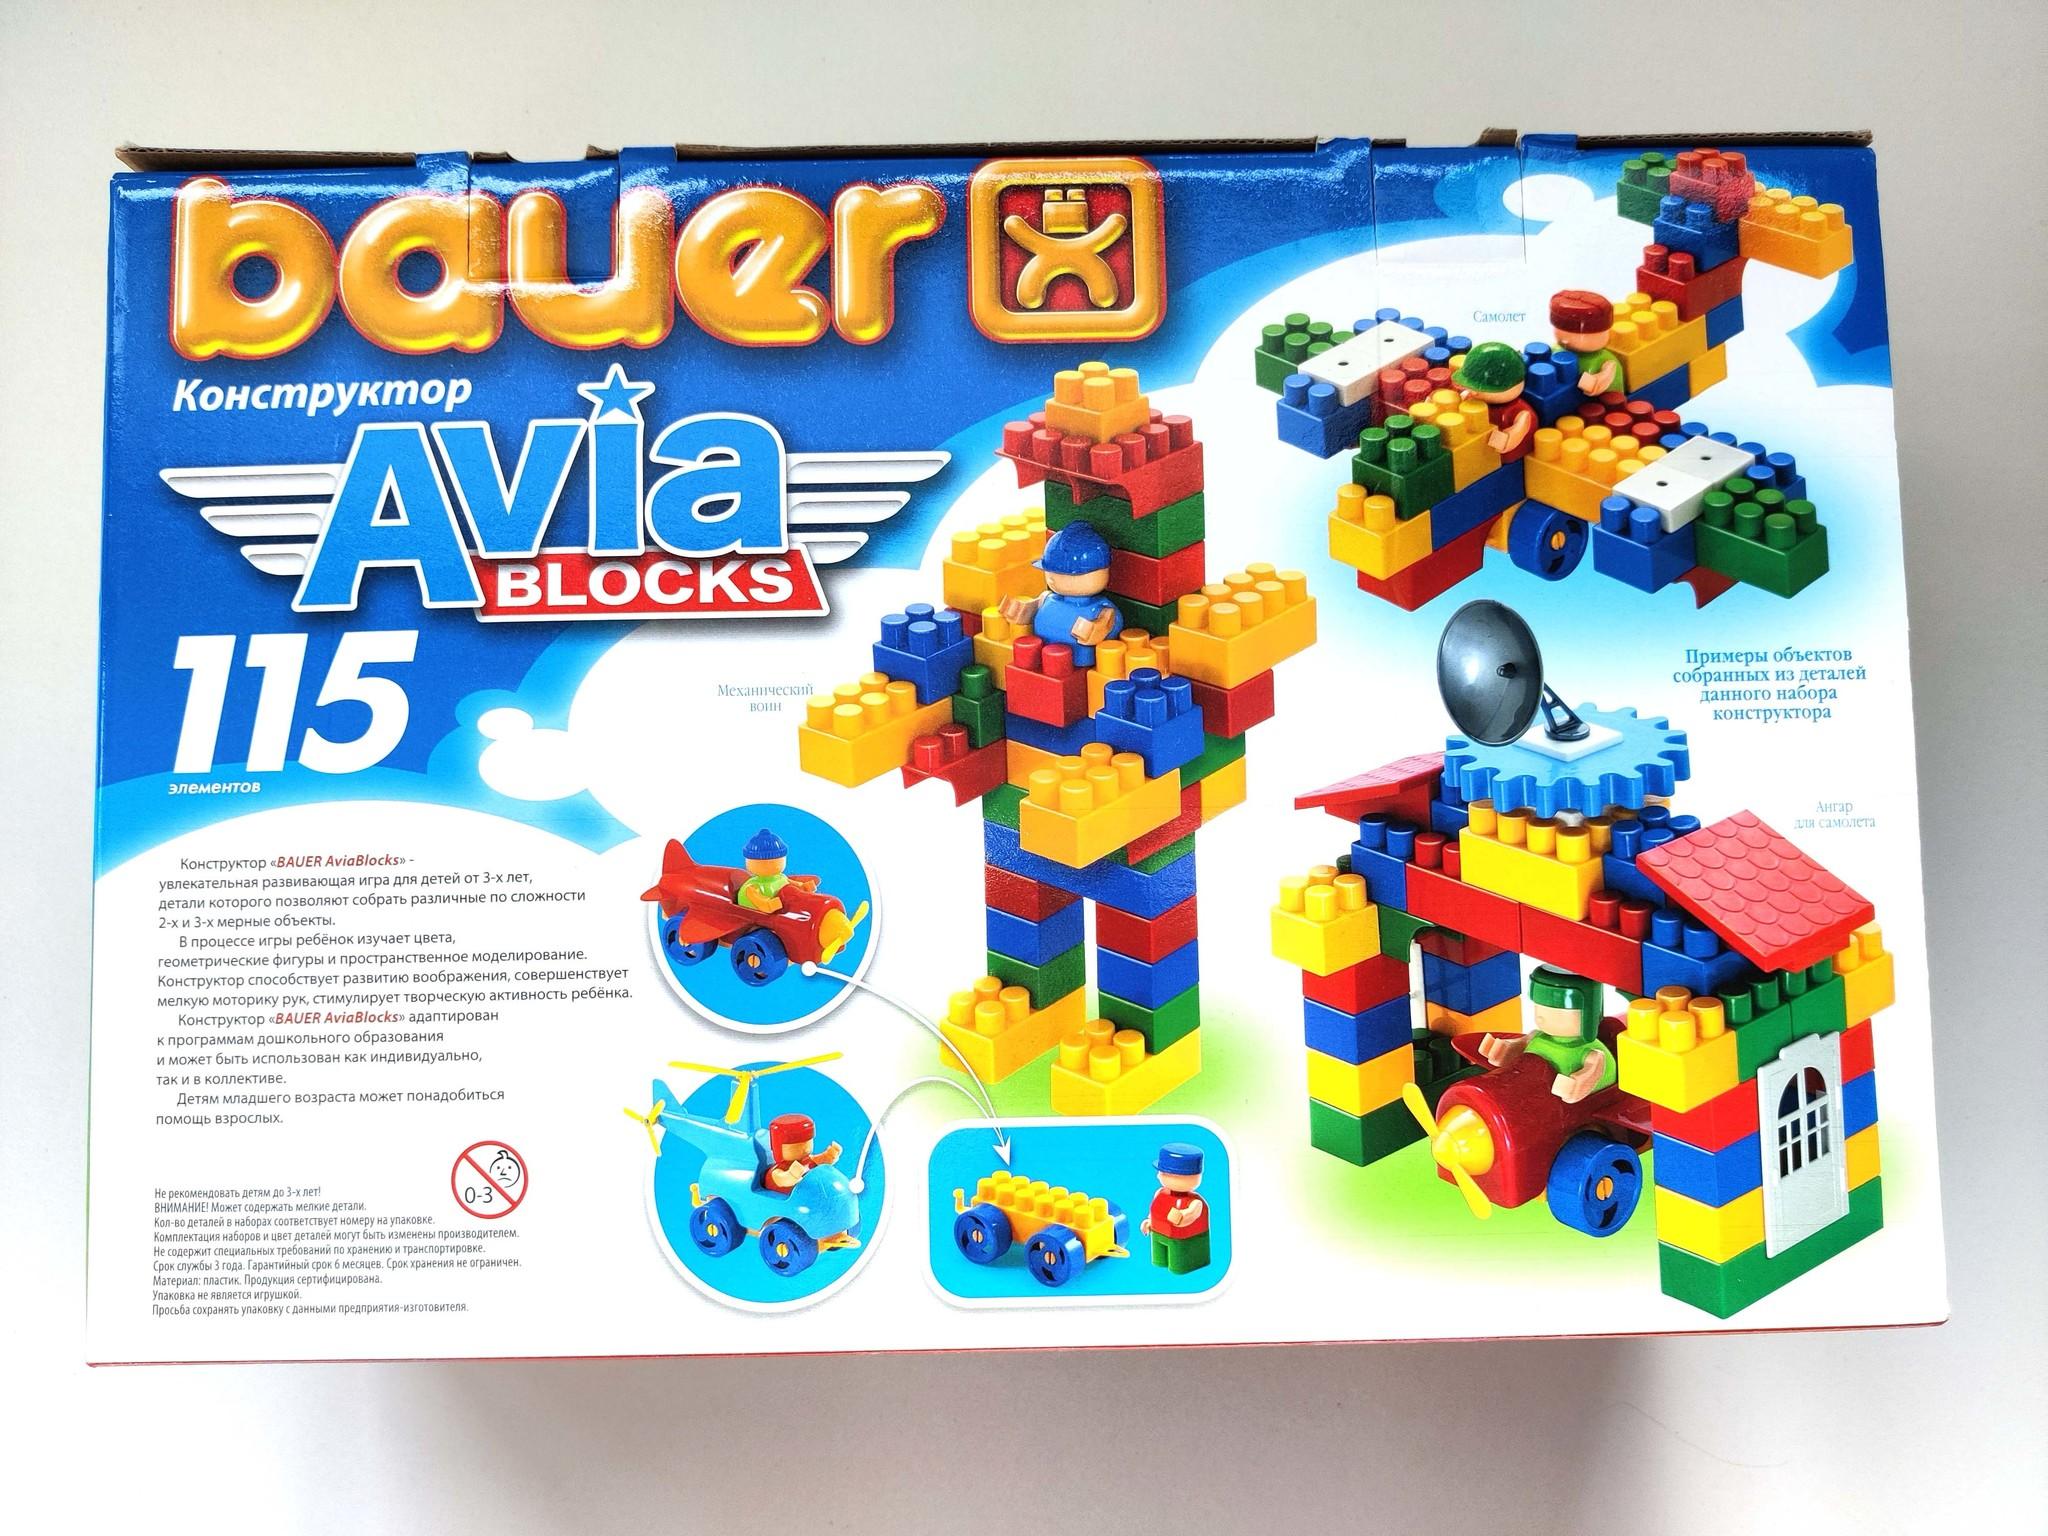 Blokken Bauer-3